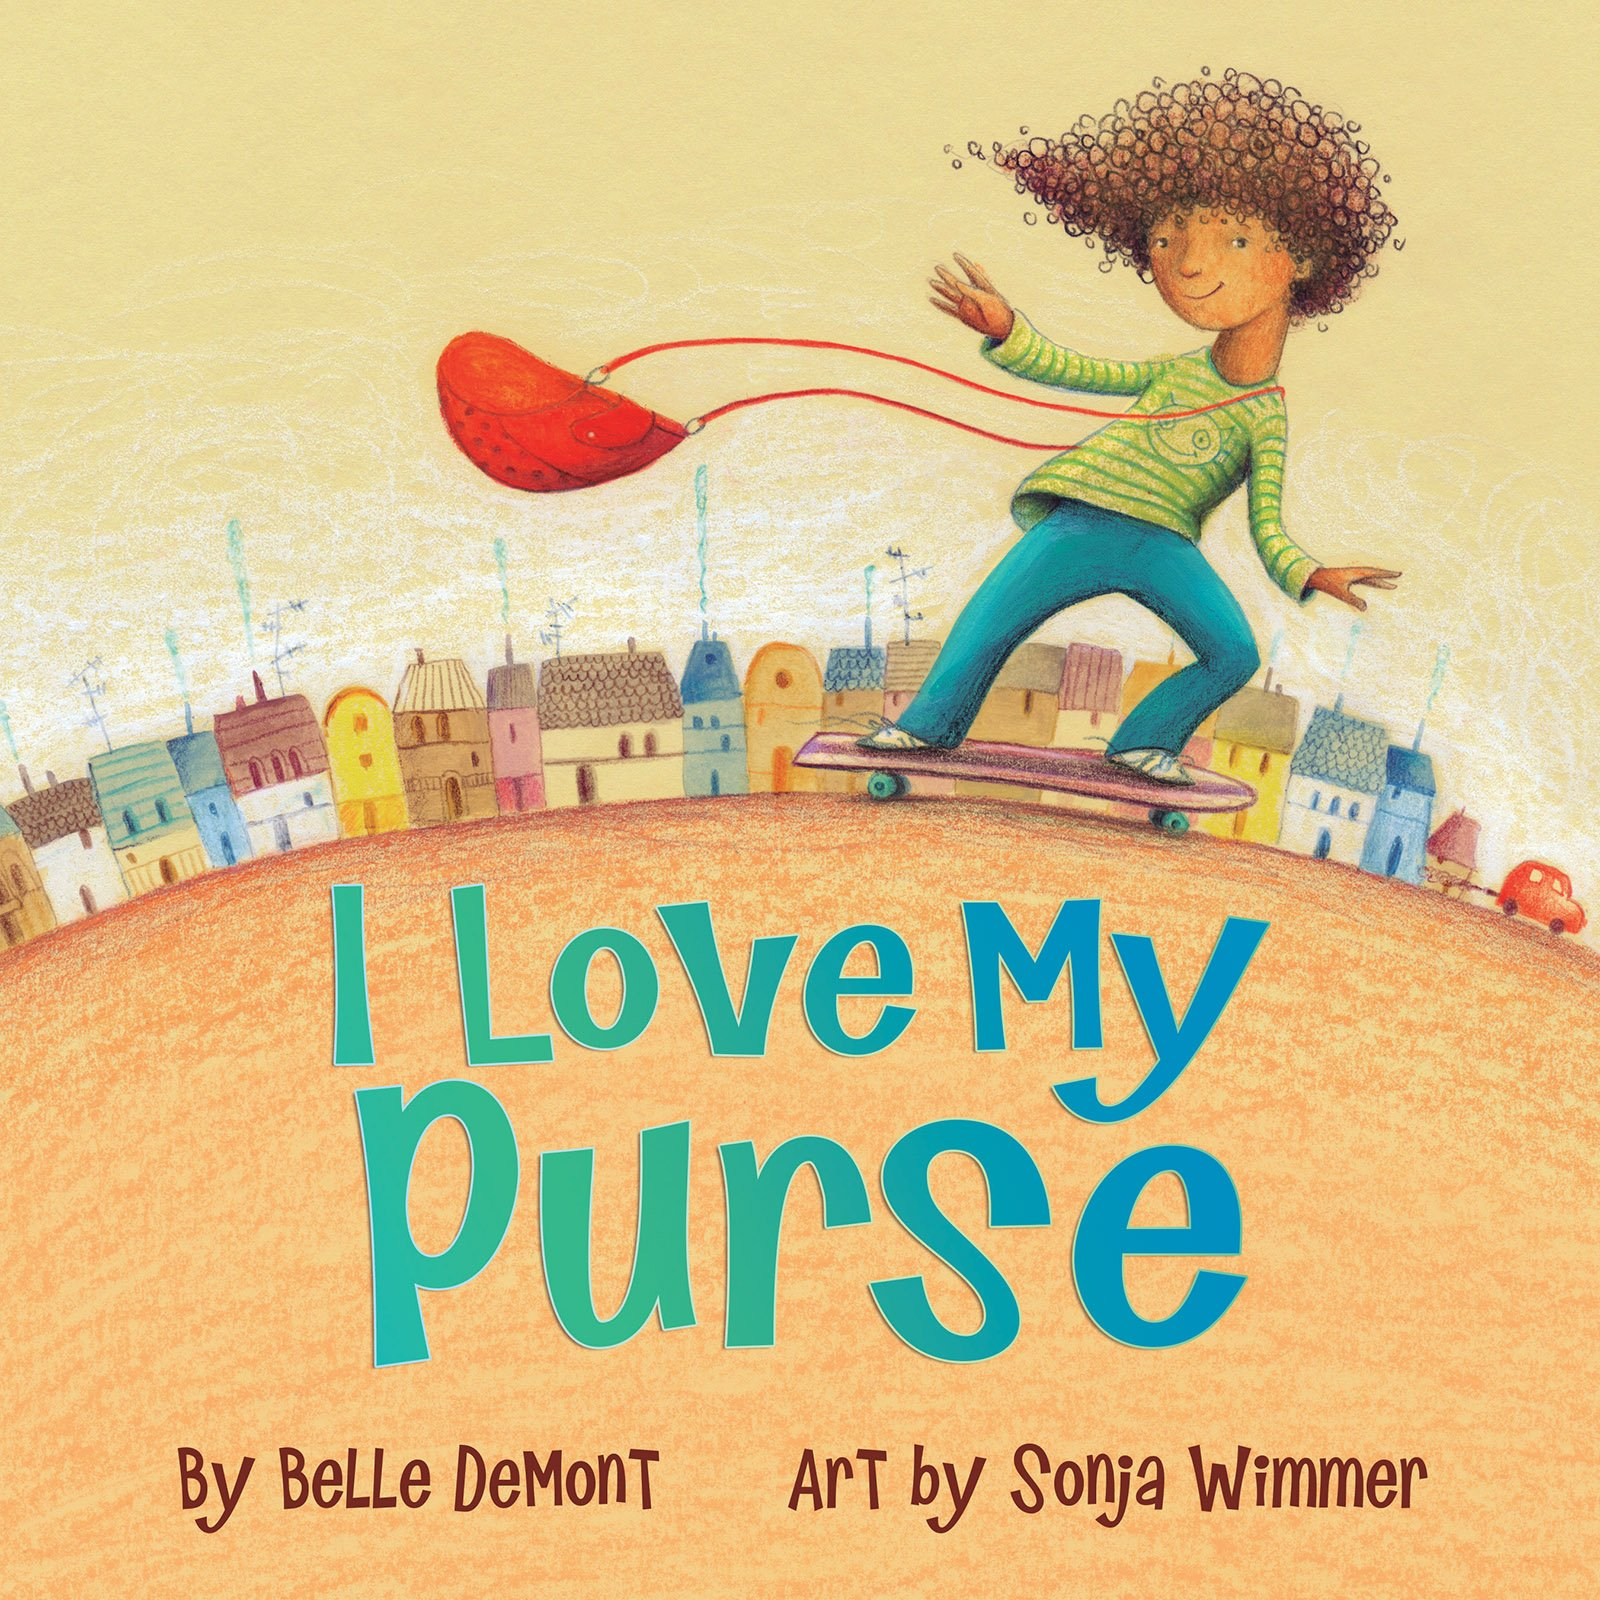 I Love My Purse: Demont, Wimmer: 9781554519545: Amazon.com: Books